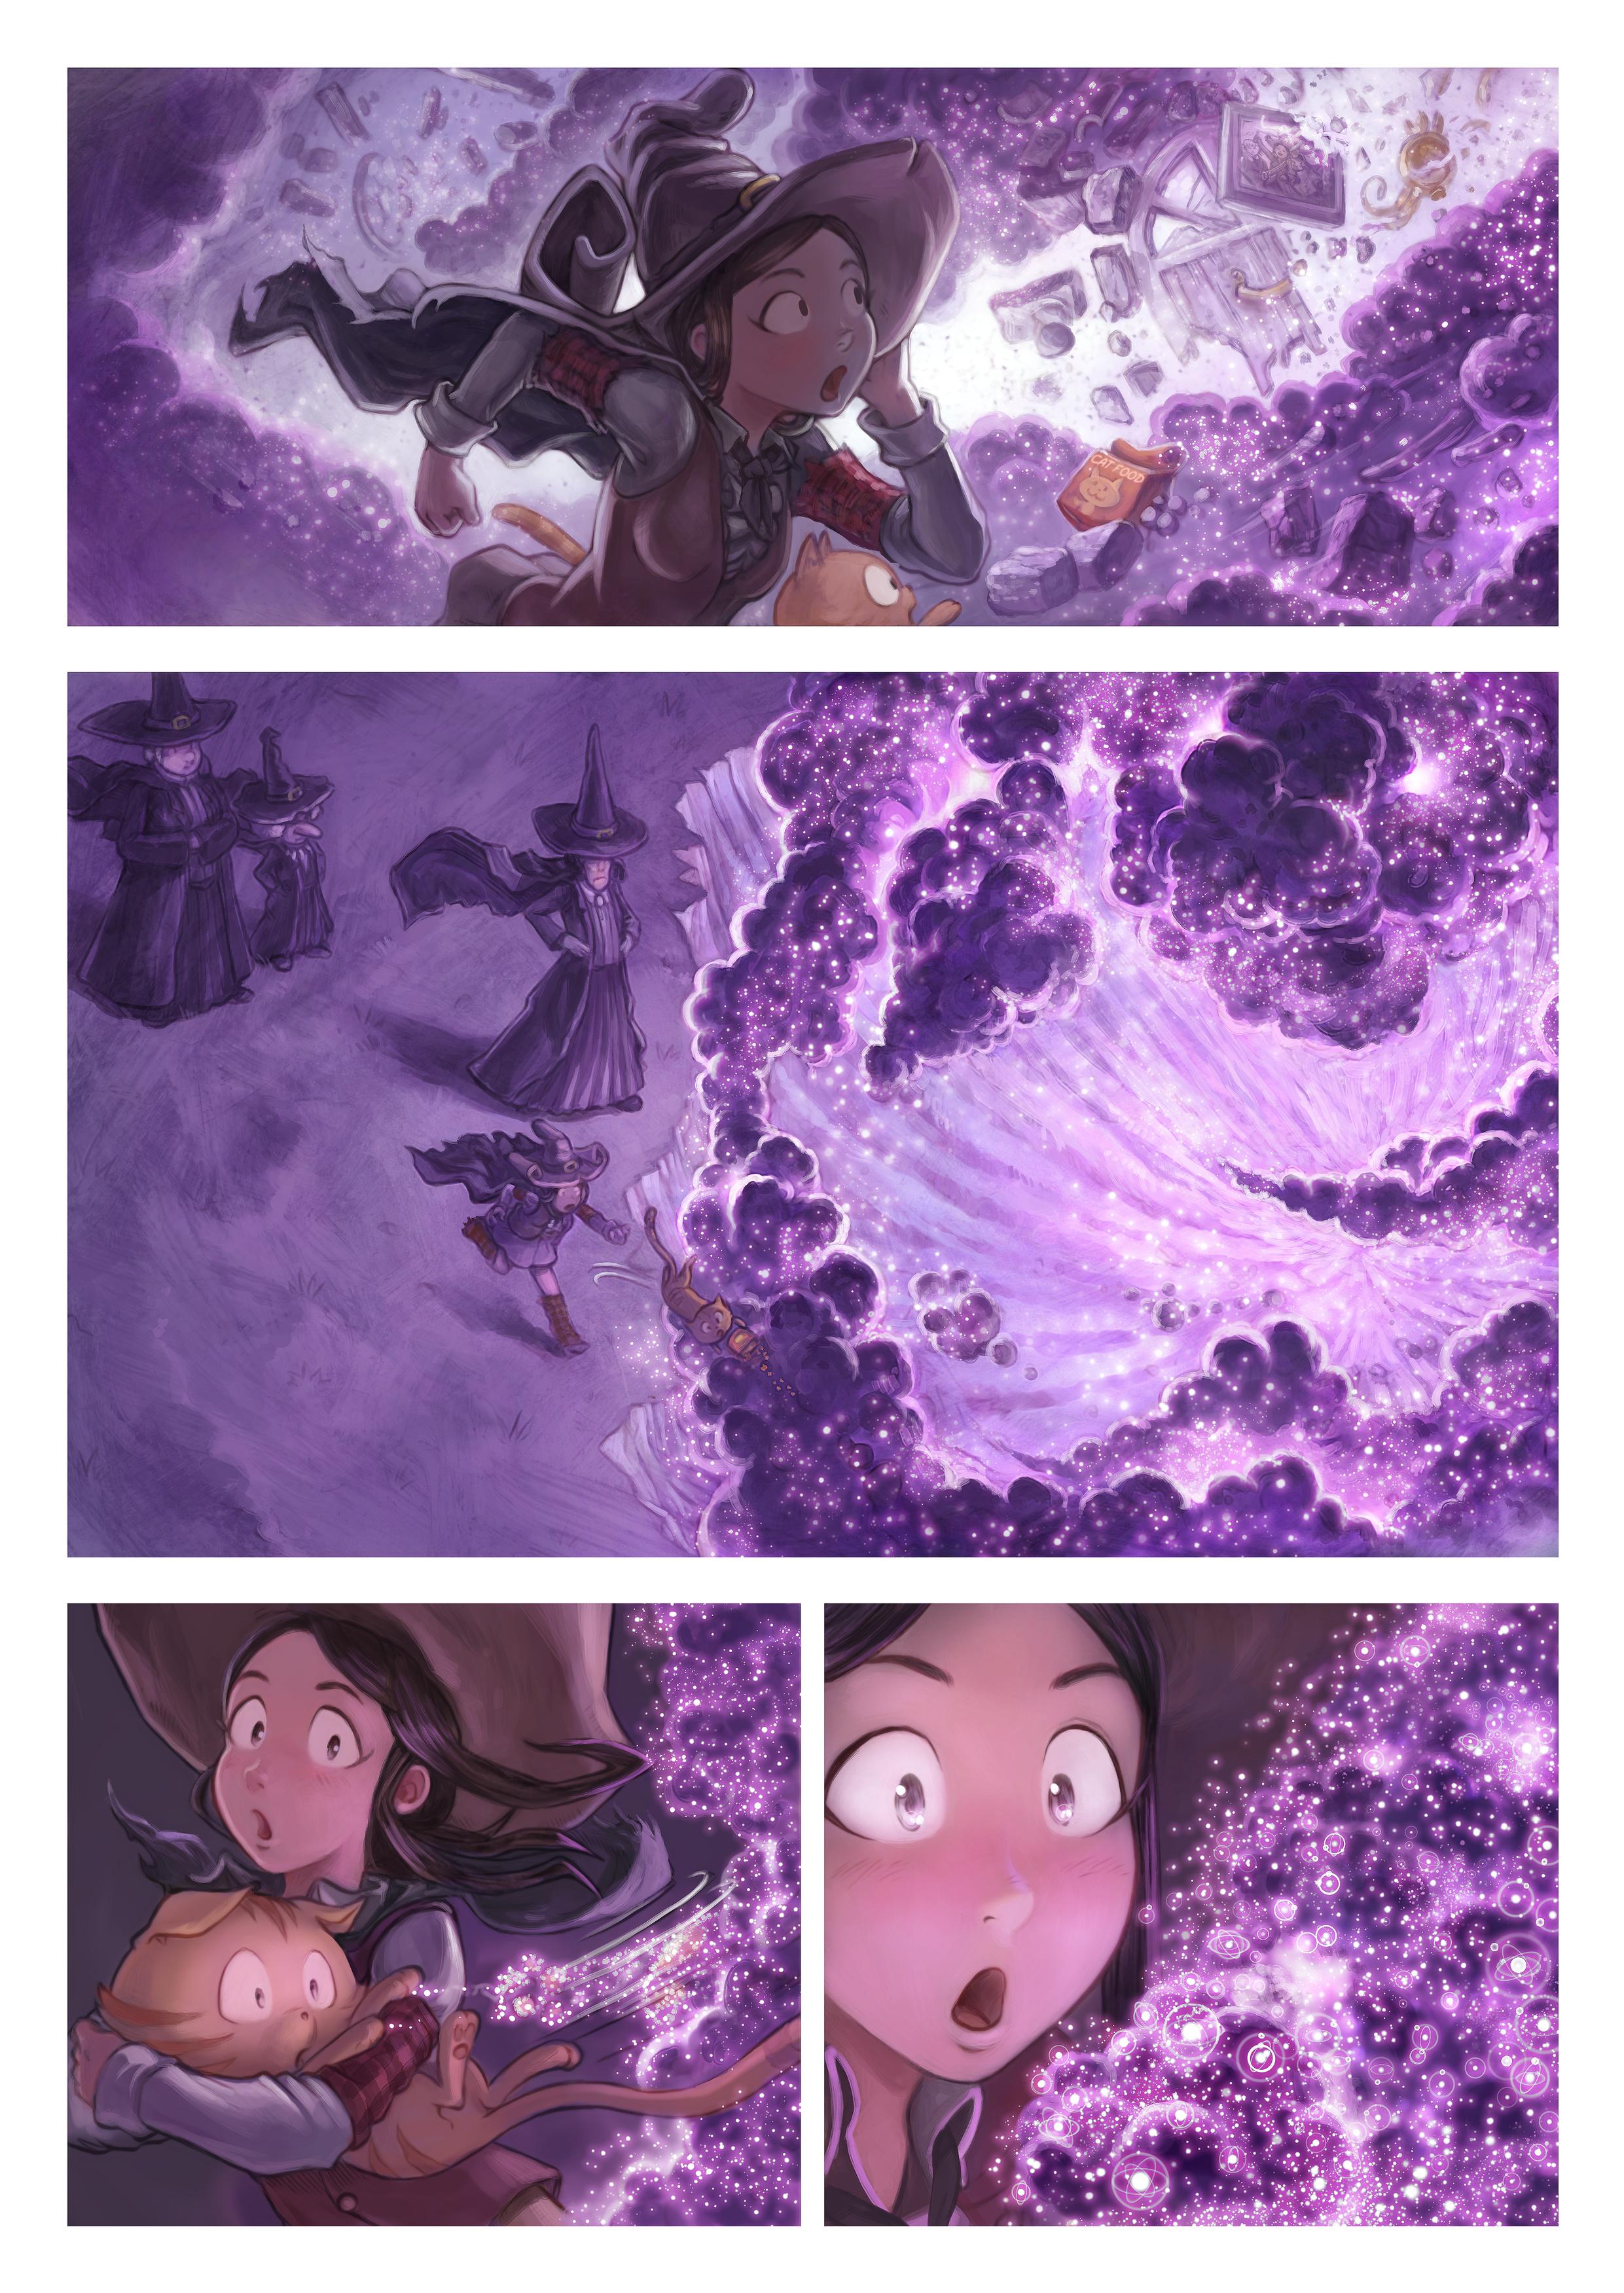 Episode 25: Det finnes ingen snarveier, Page 4